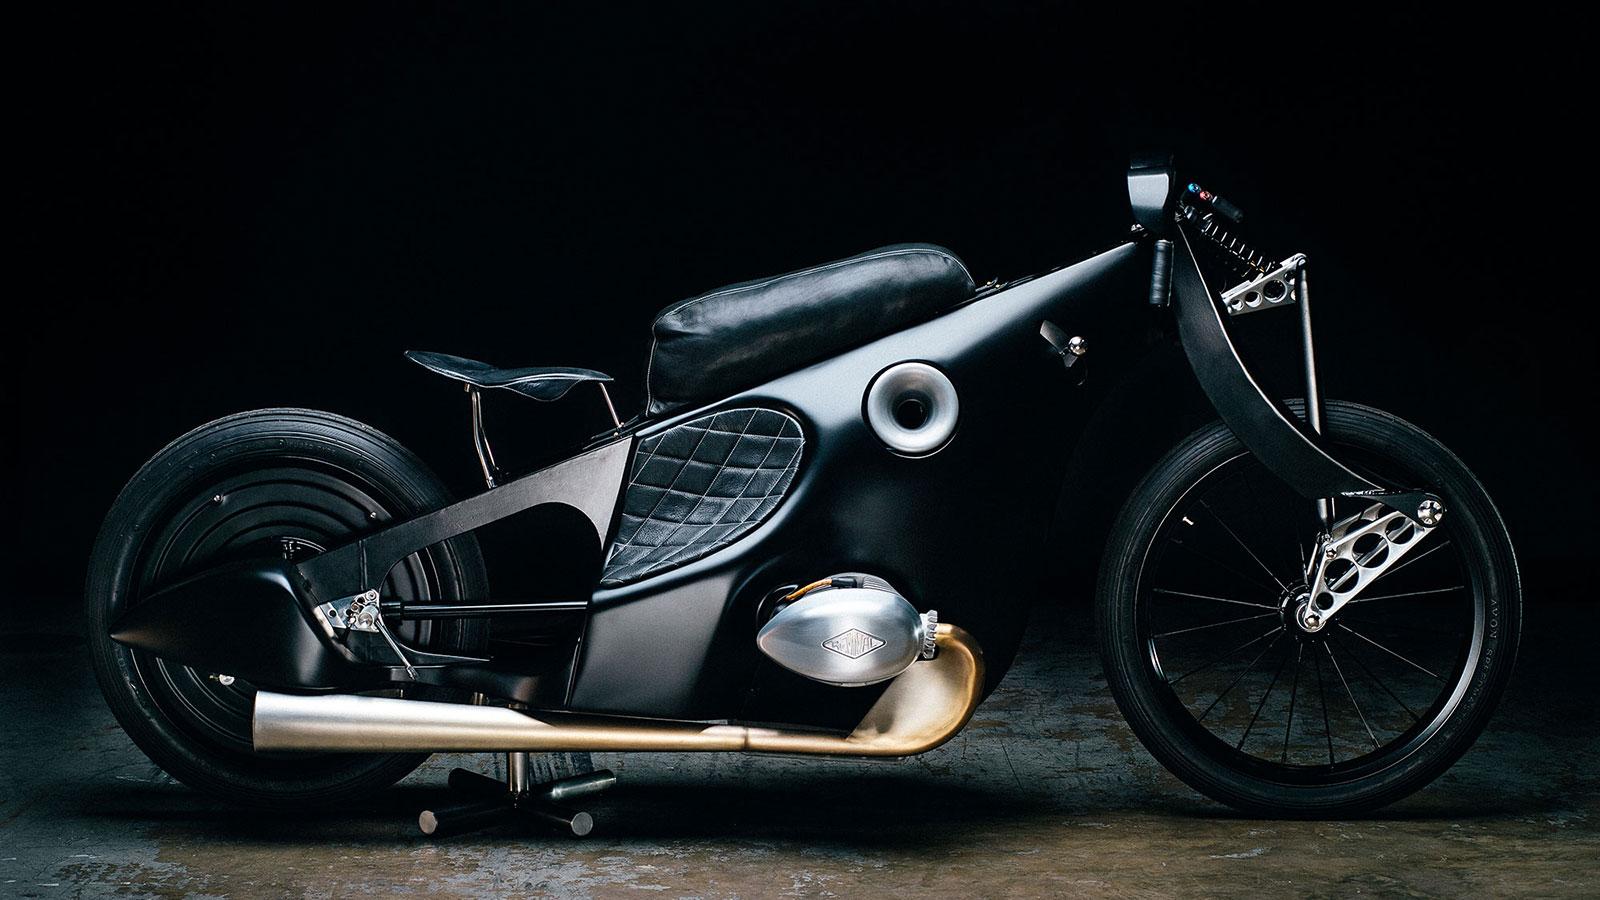 BMW Landspeeder by Revival Cycles